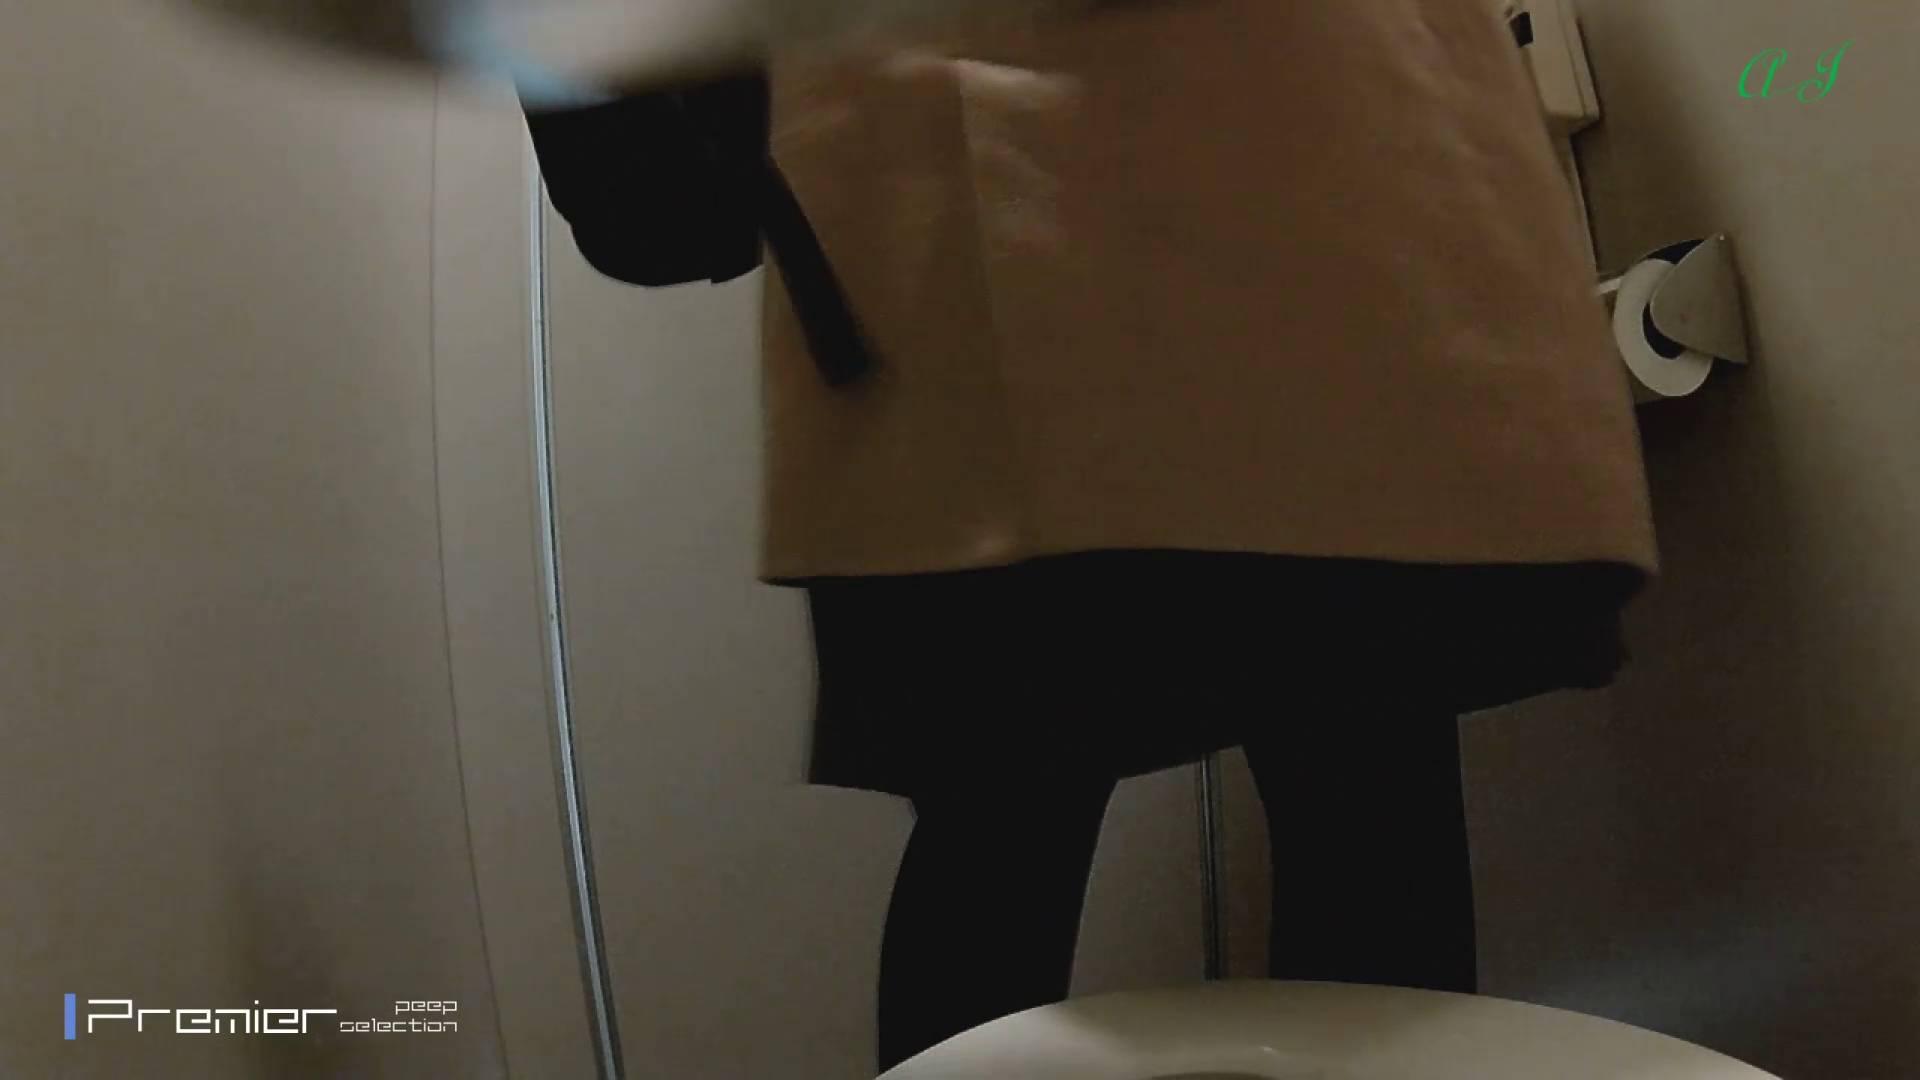 有名大学女性洗面所 vol.82 美女 盗撮AV動画キャプチャ 31pic 5